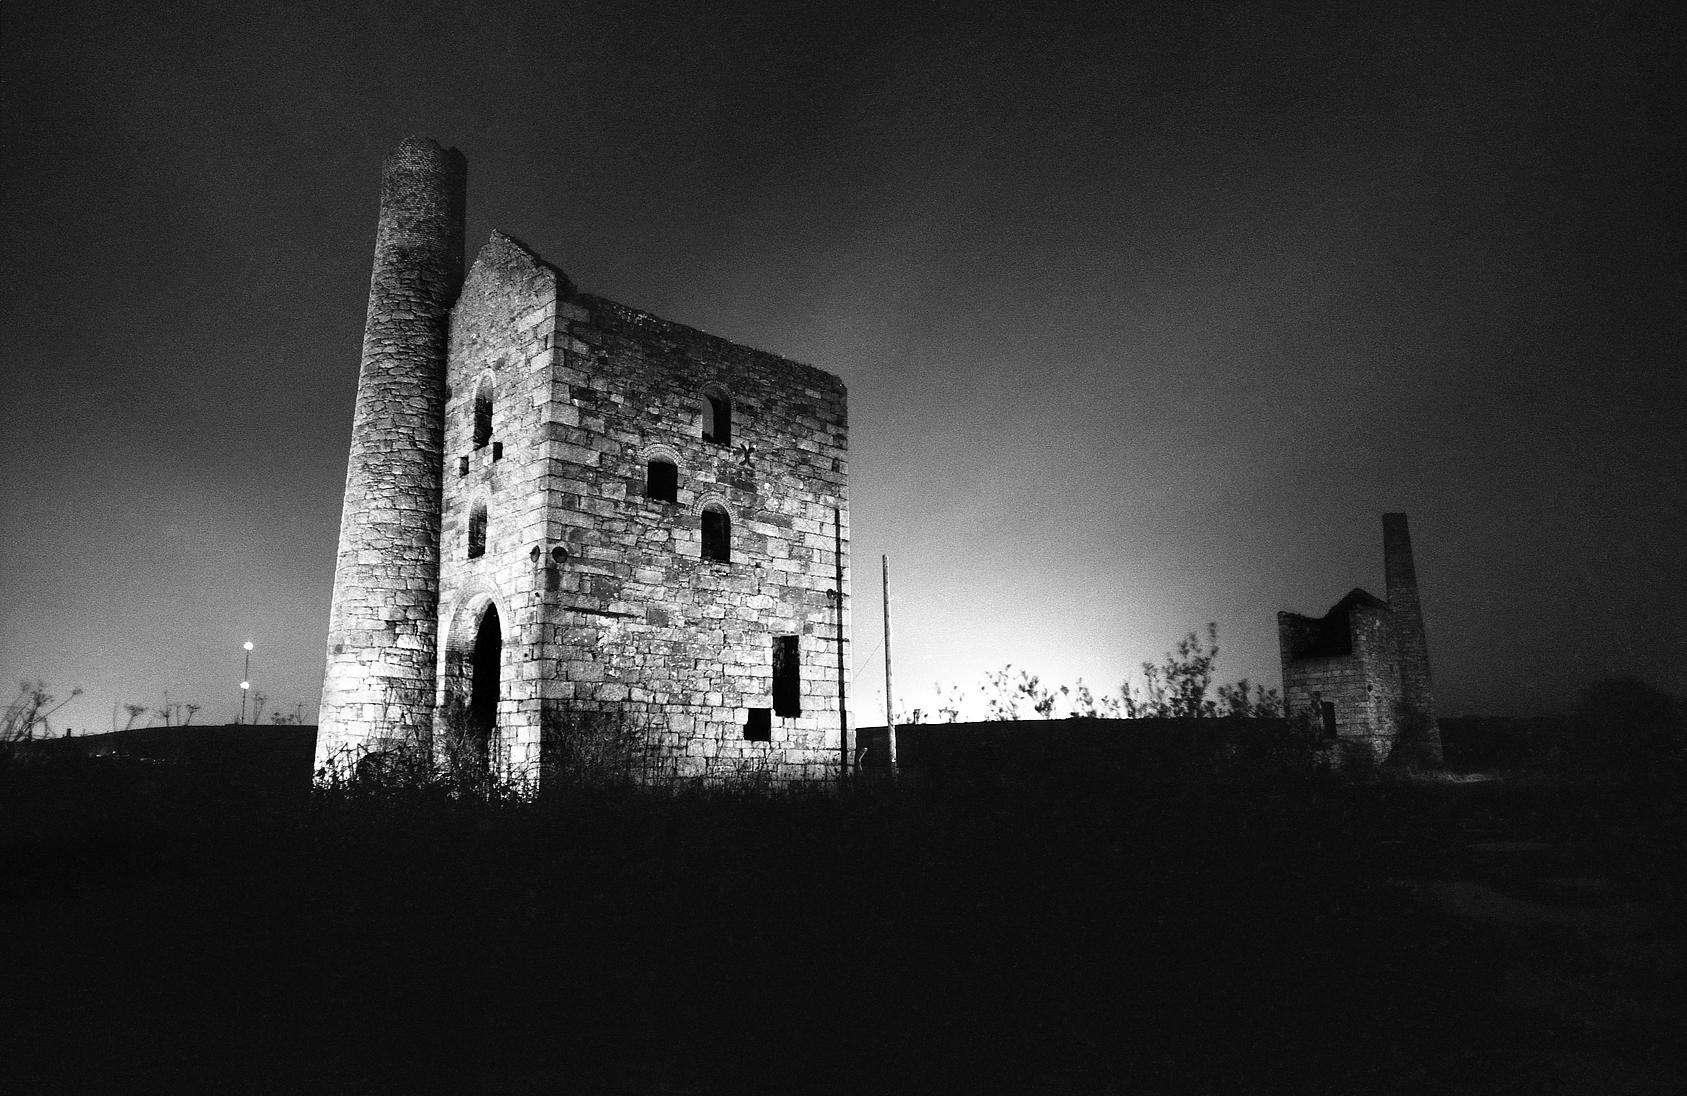 Grenville United Engine Houses, Cornwall, illuminated at night,